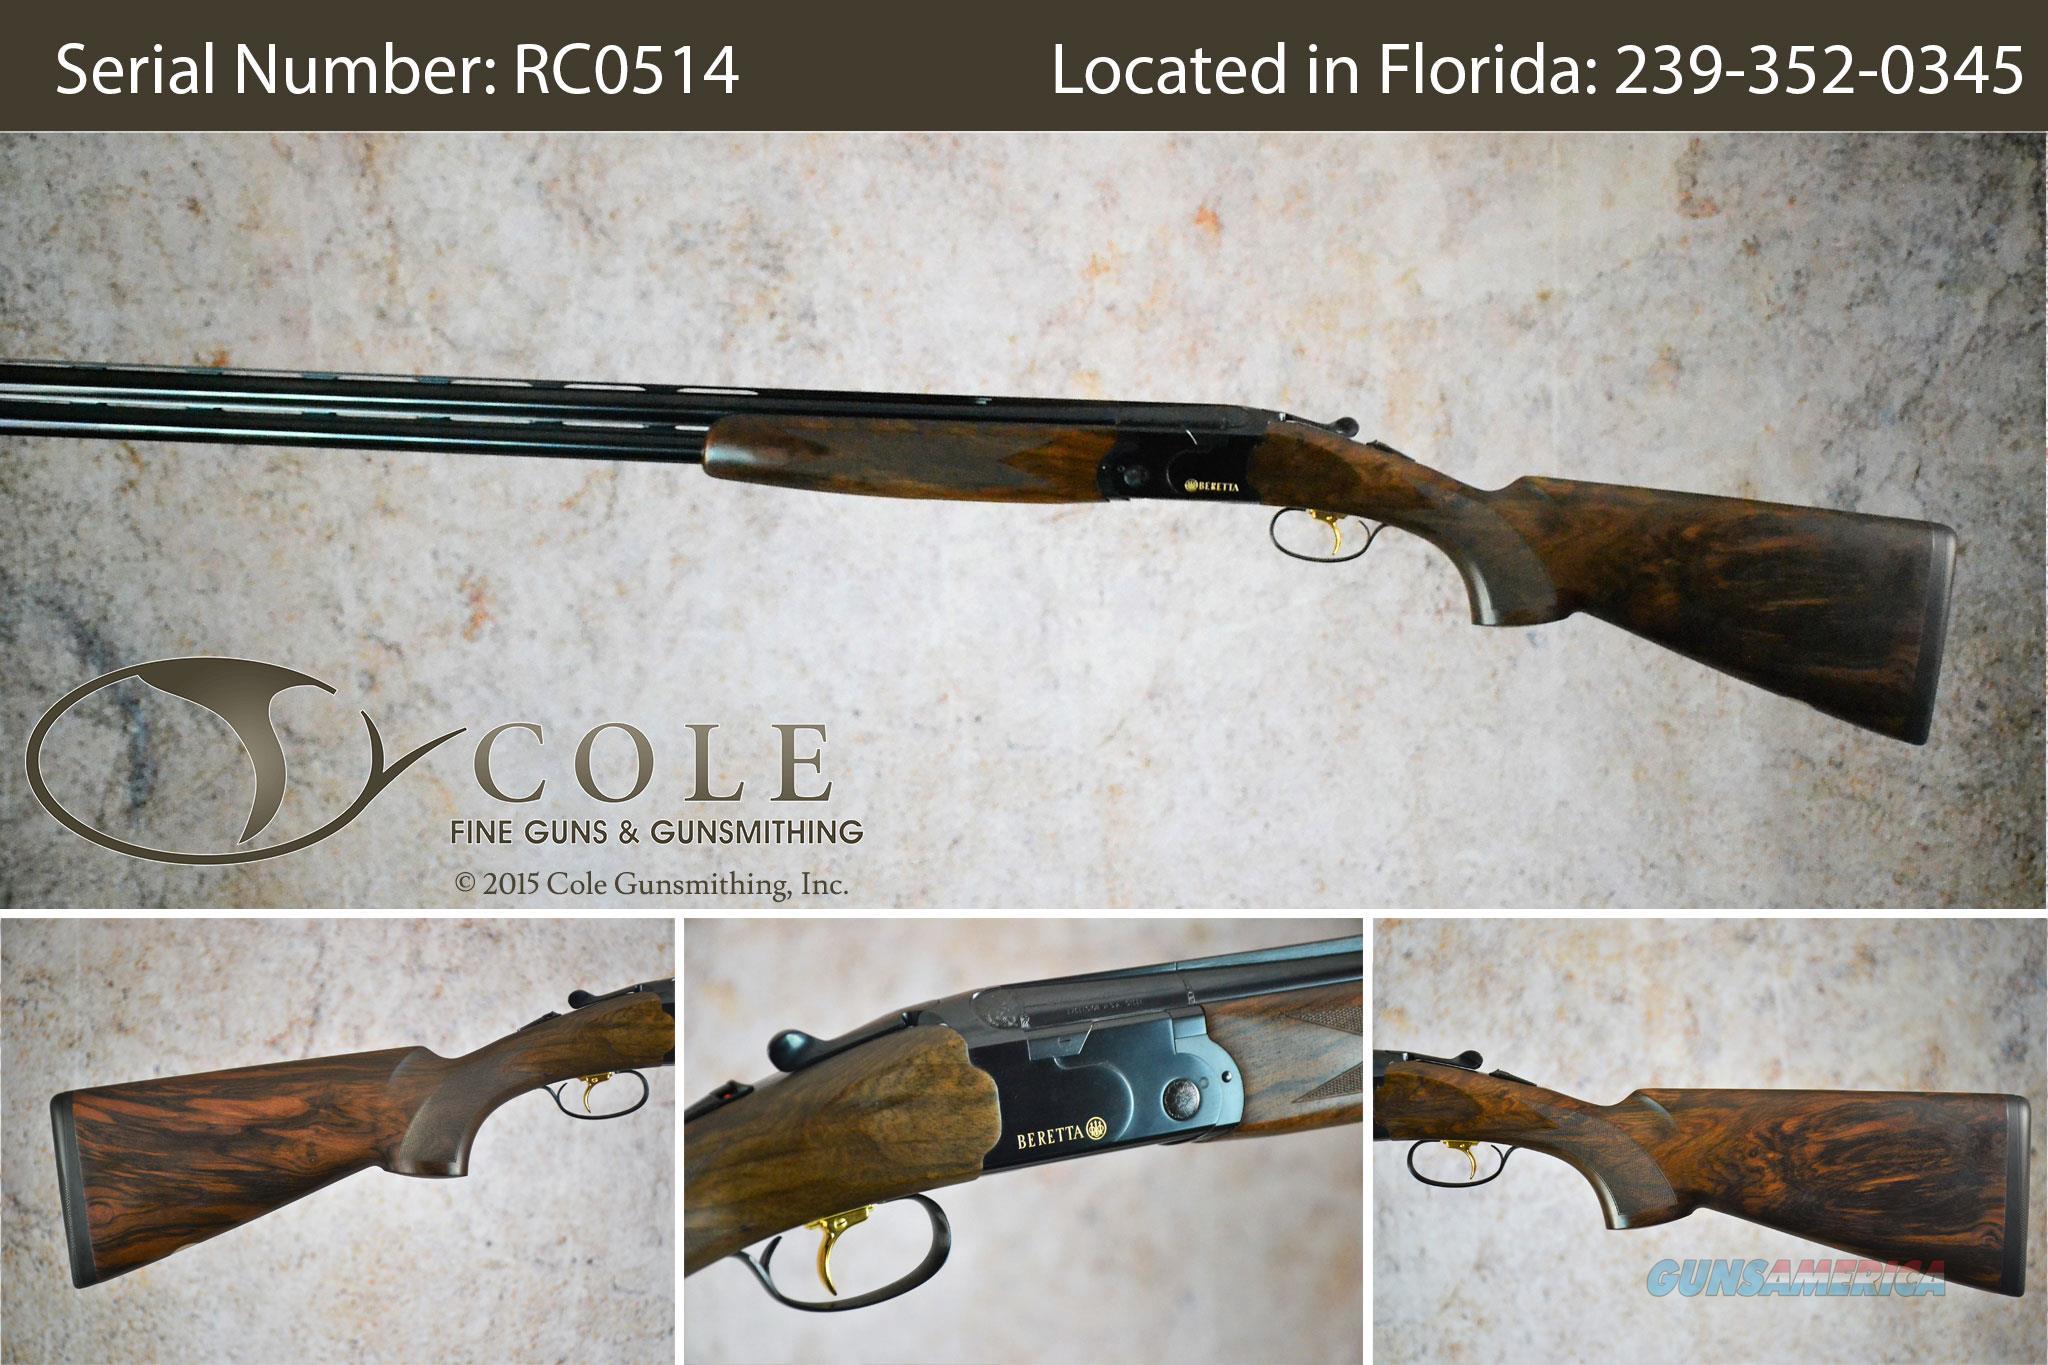 "Beretta 686 Cole Special Sporting 12g 30"" SN:#RC0514  Guns > Shotguns > Beretta Shotguns > O/U > Trap/Skeet"